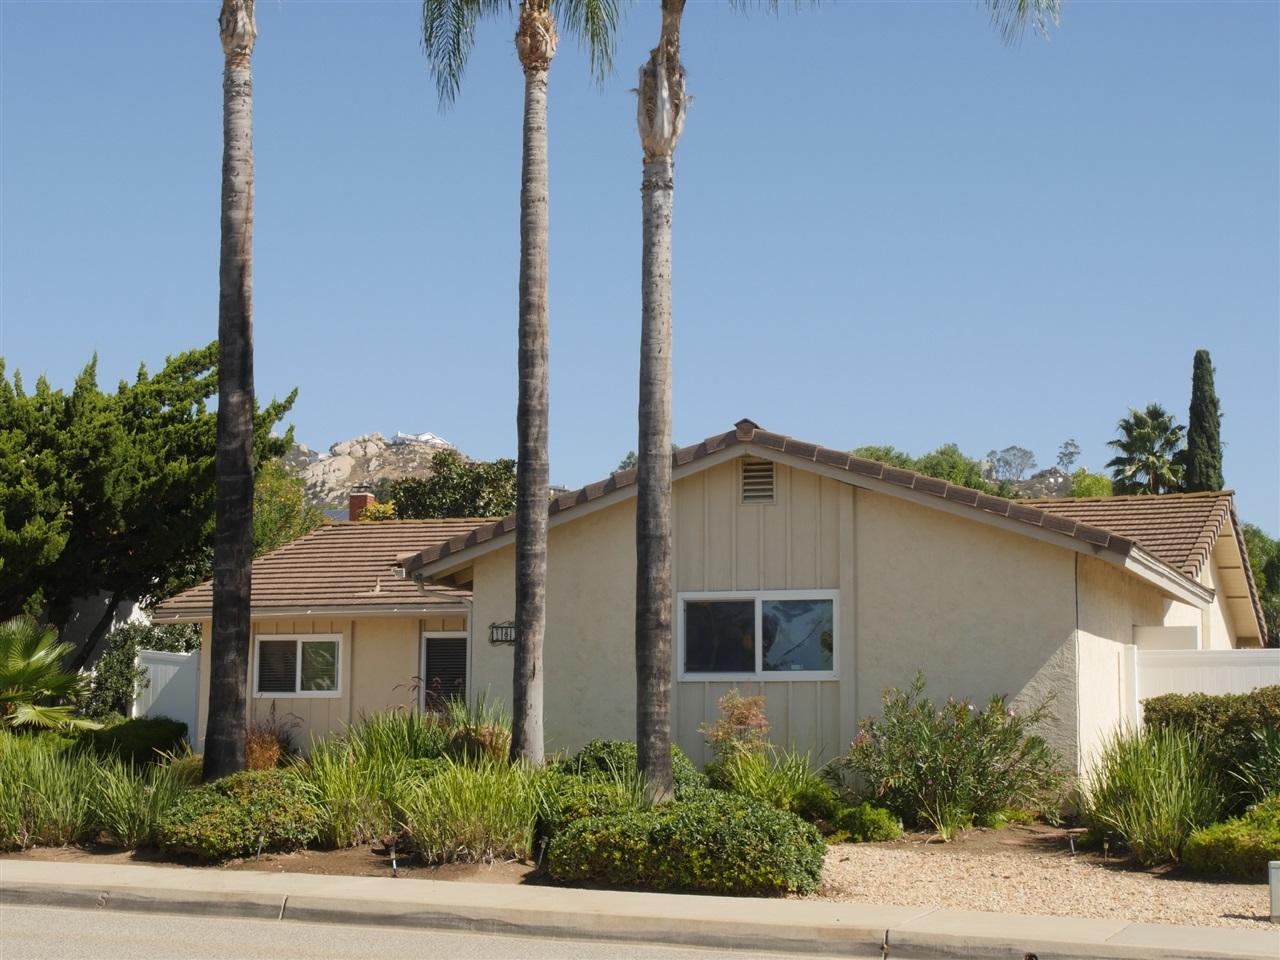 1814 David Drive, Escondido, CA 92026